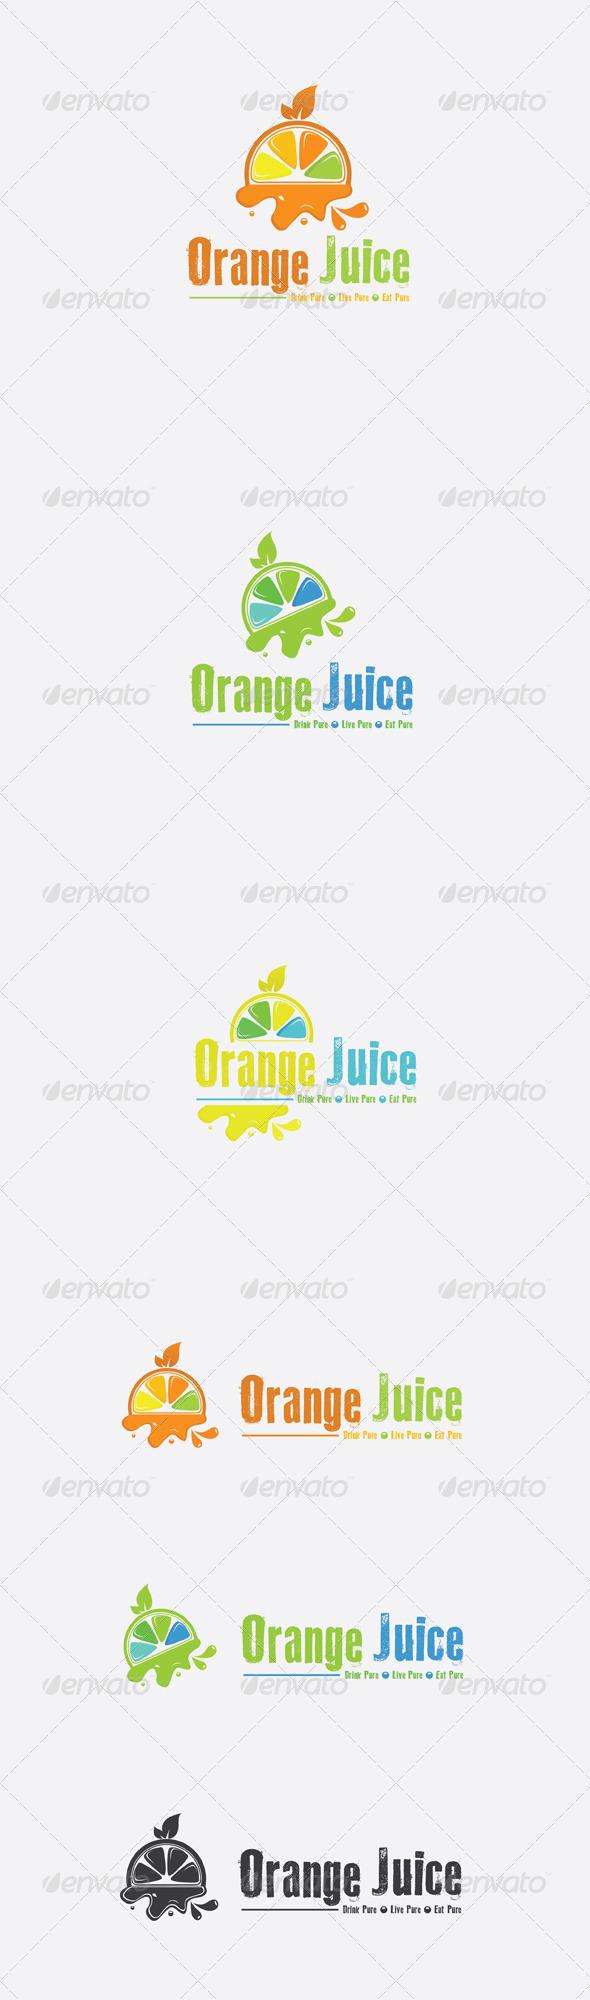 GraphicRiver Orange Juice Logo 6476298